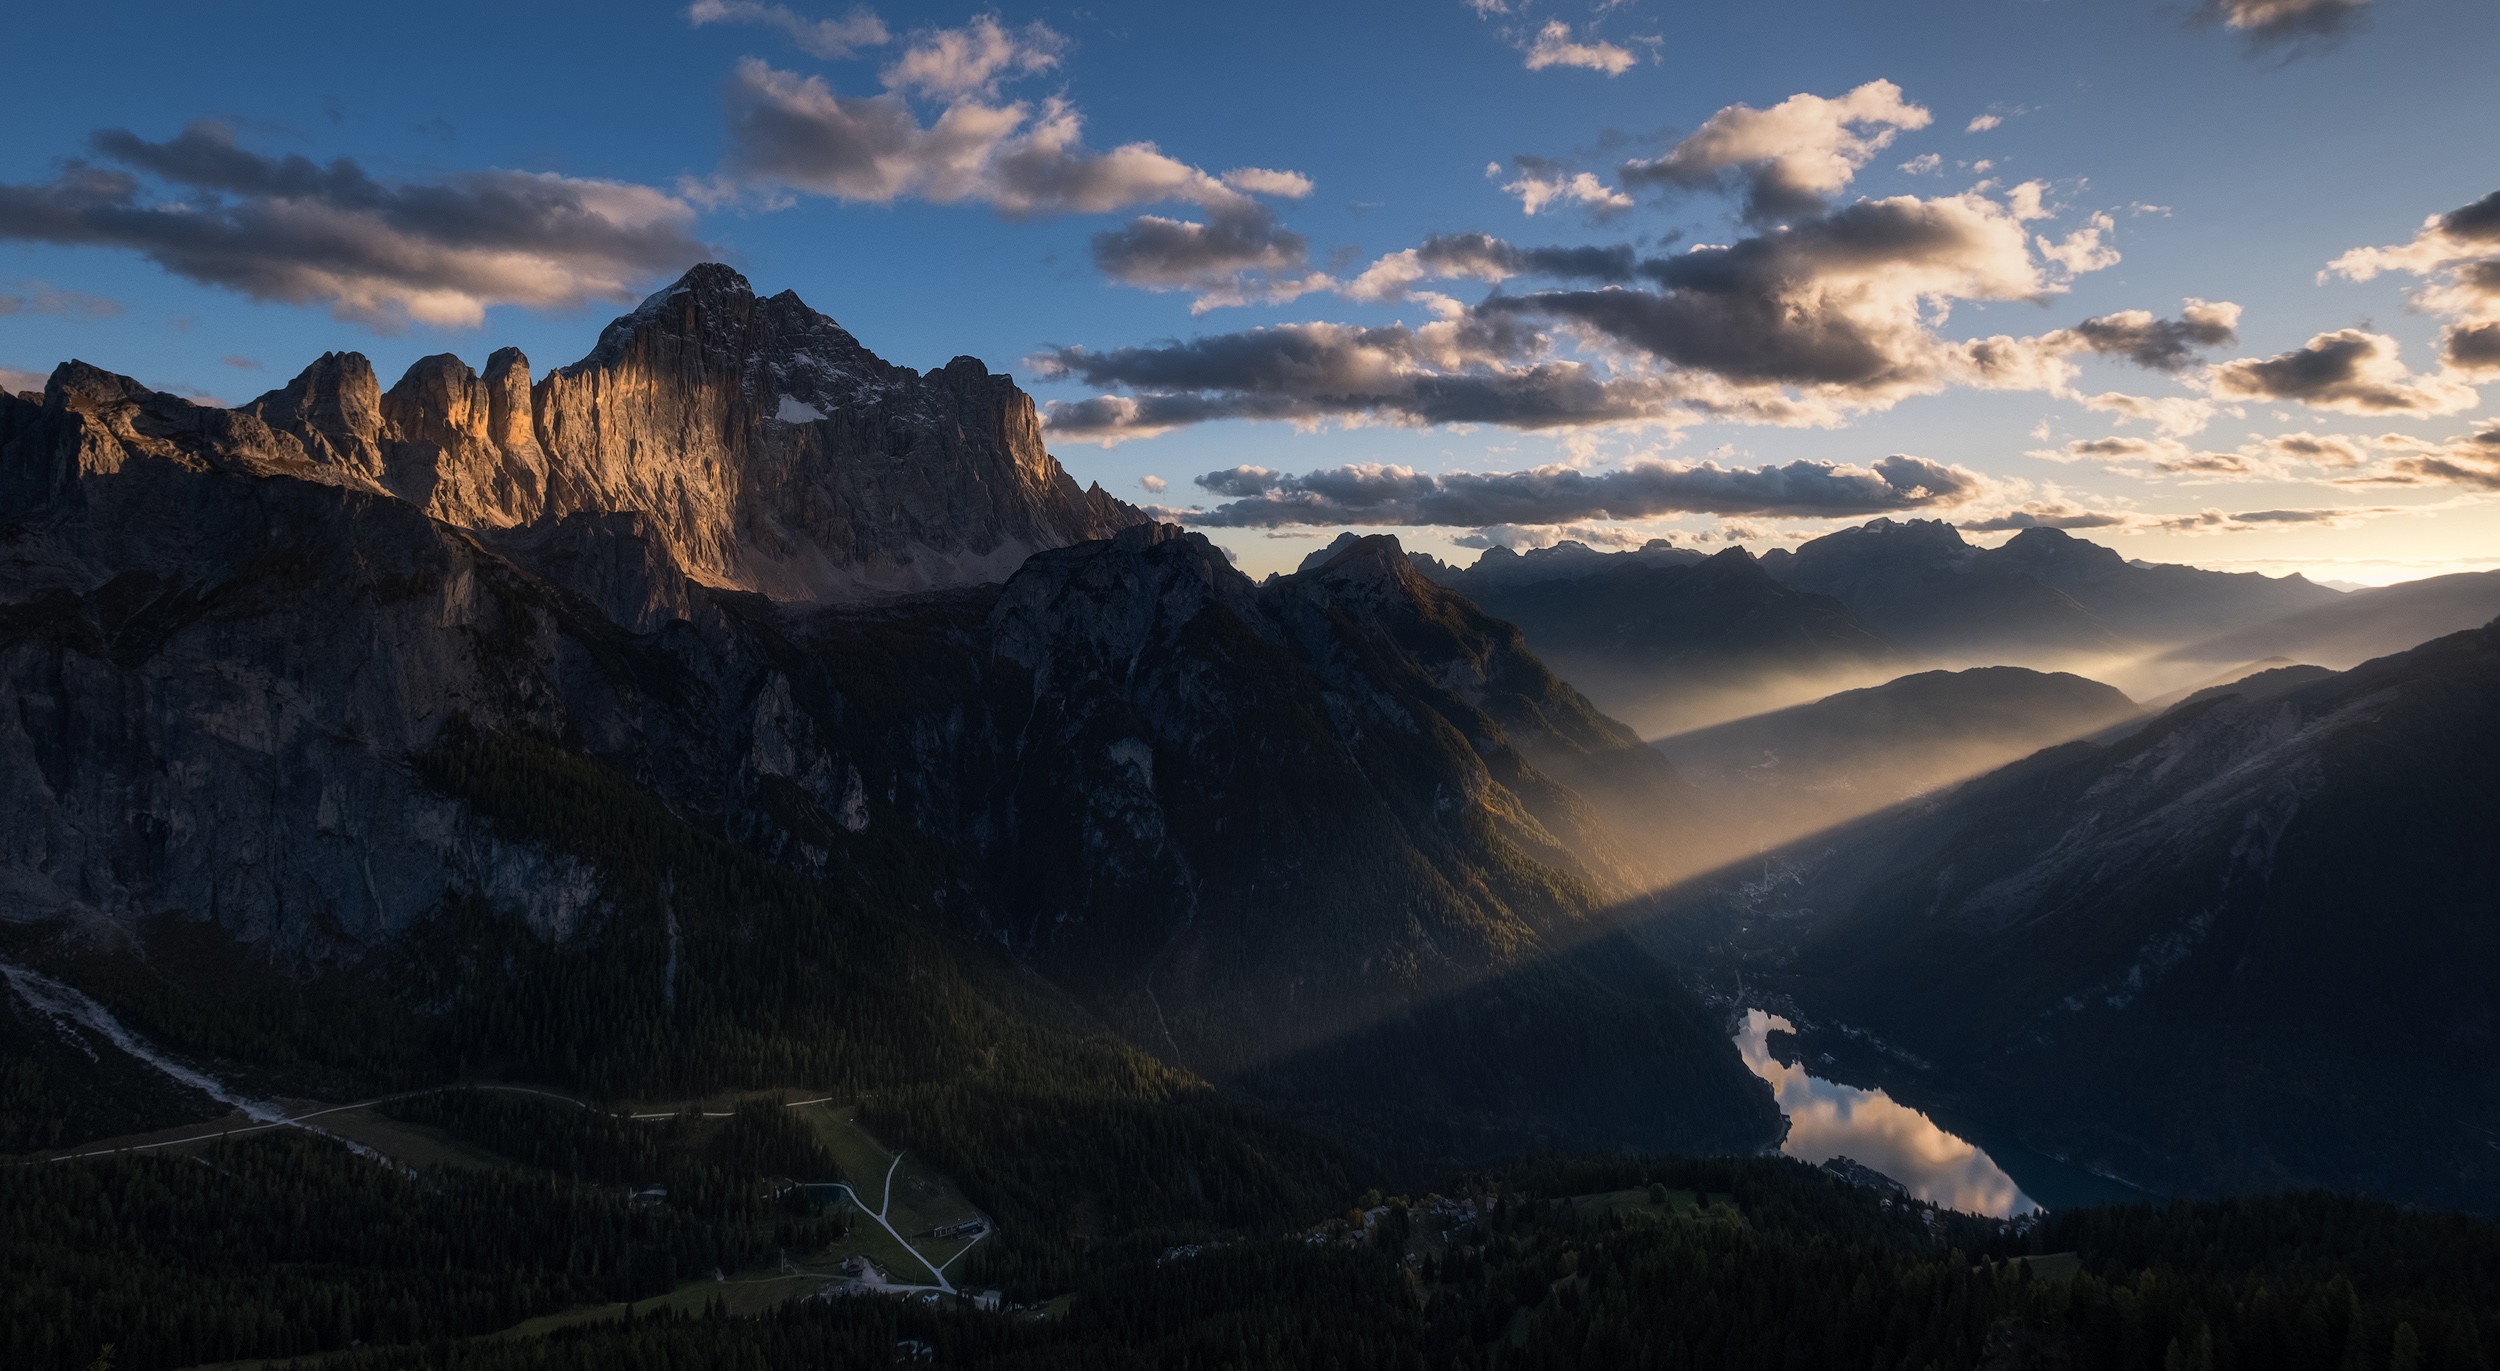 Civetta   The sun's last light on the peak of Mount Civetta in the Dolomite mountains, Italy